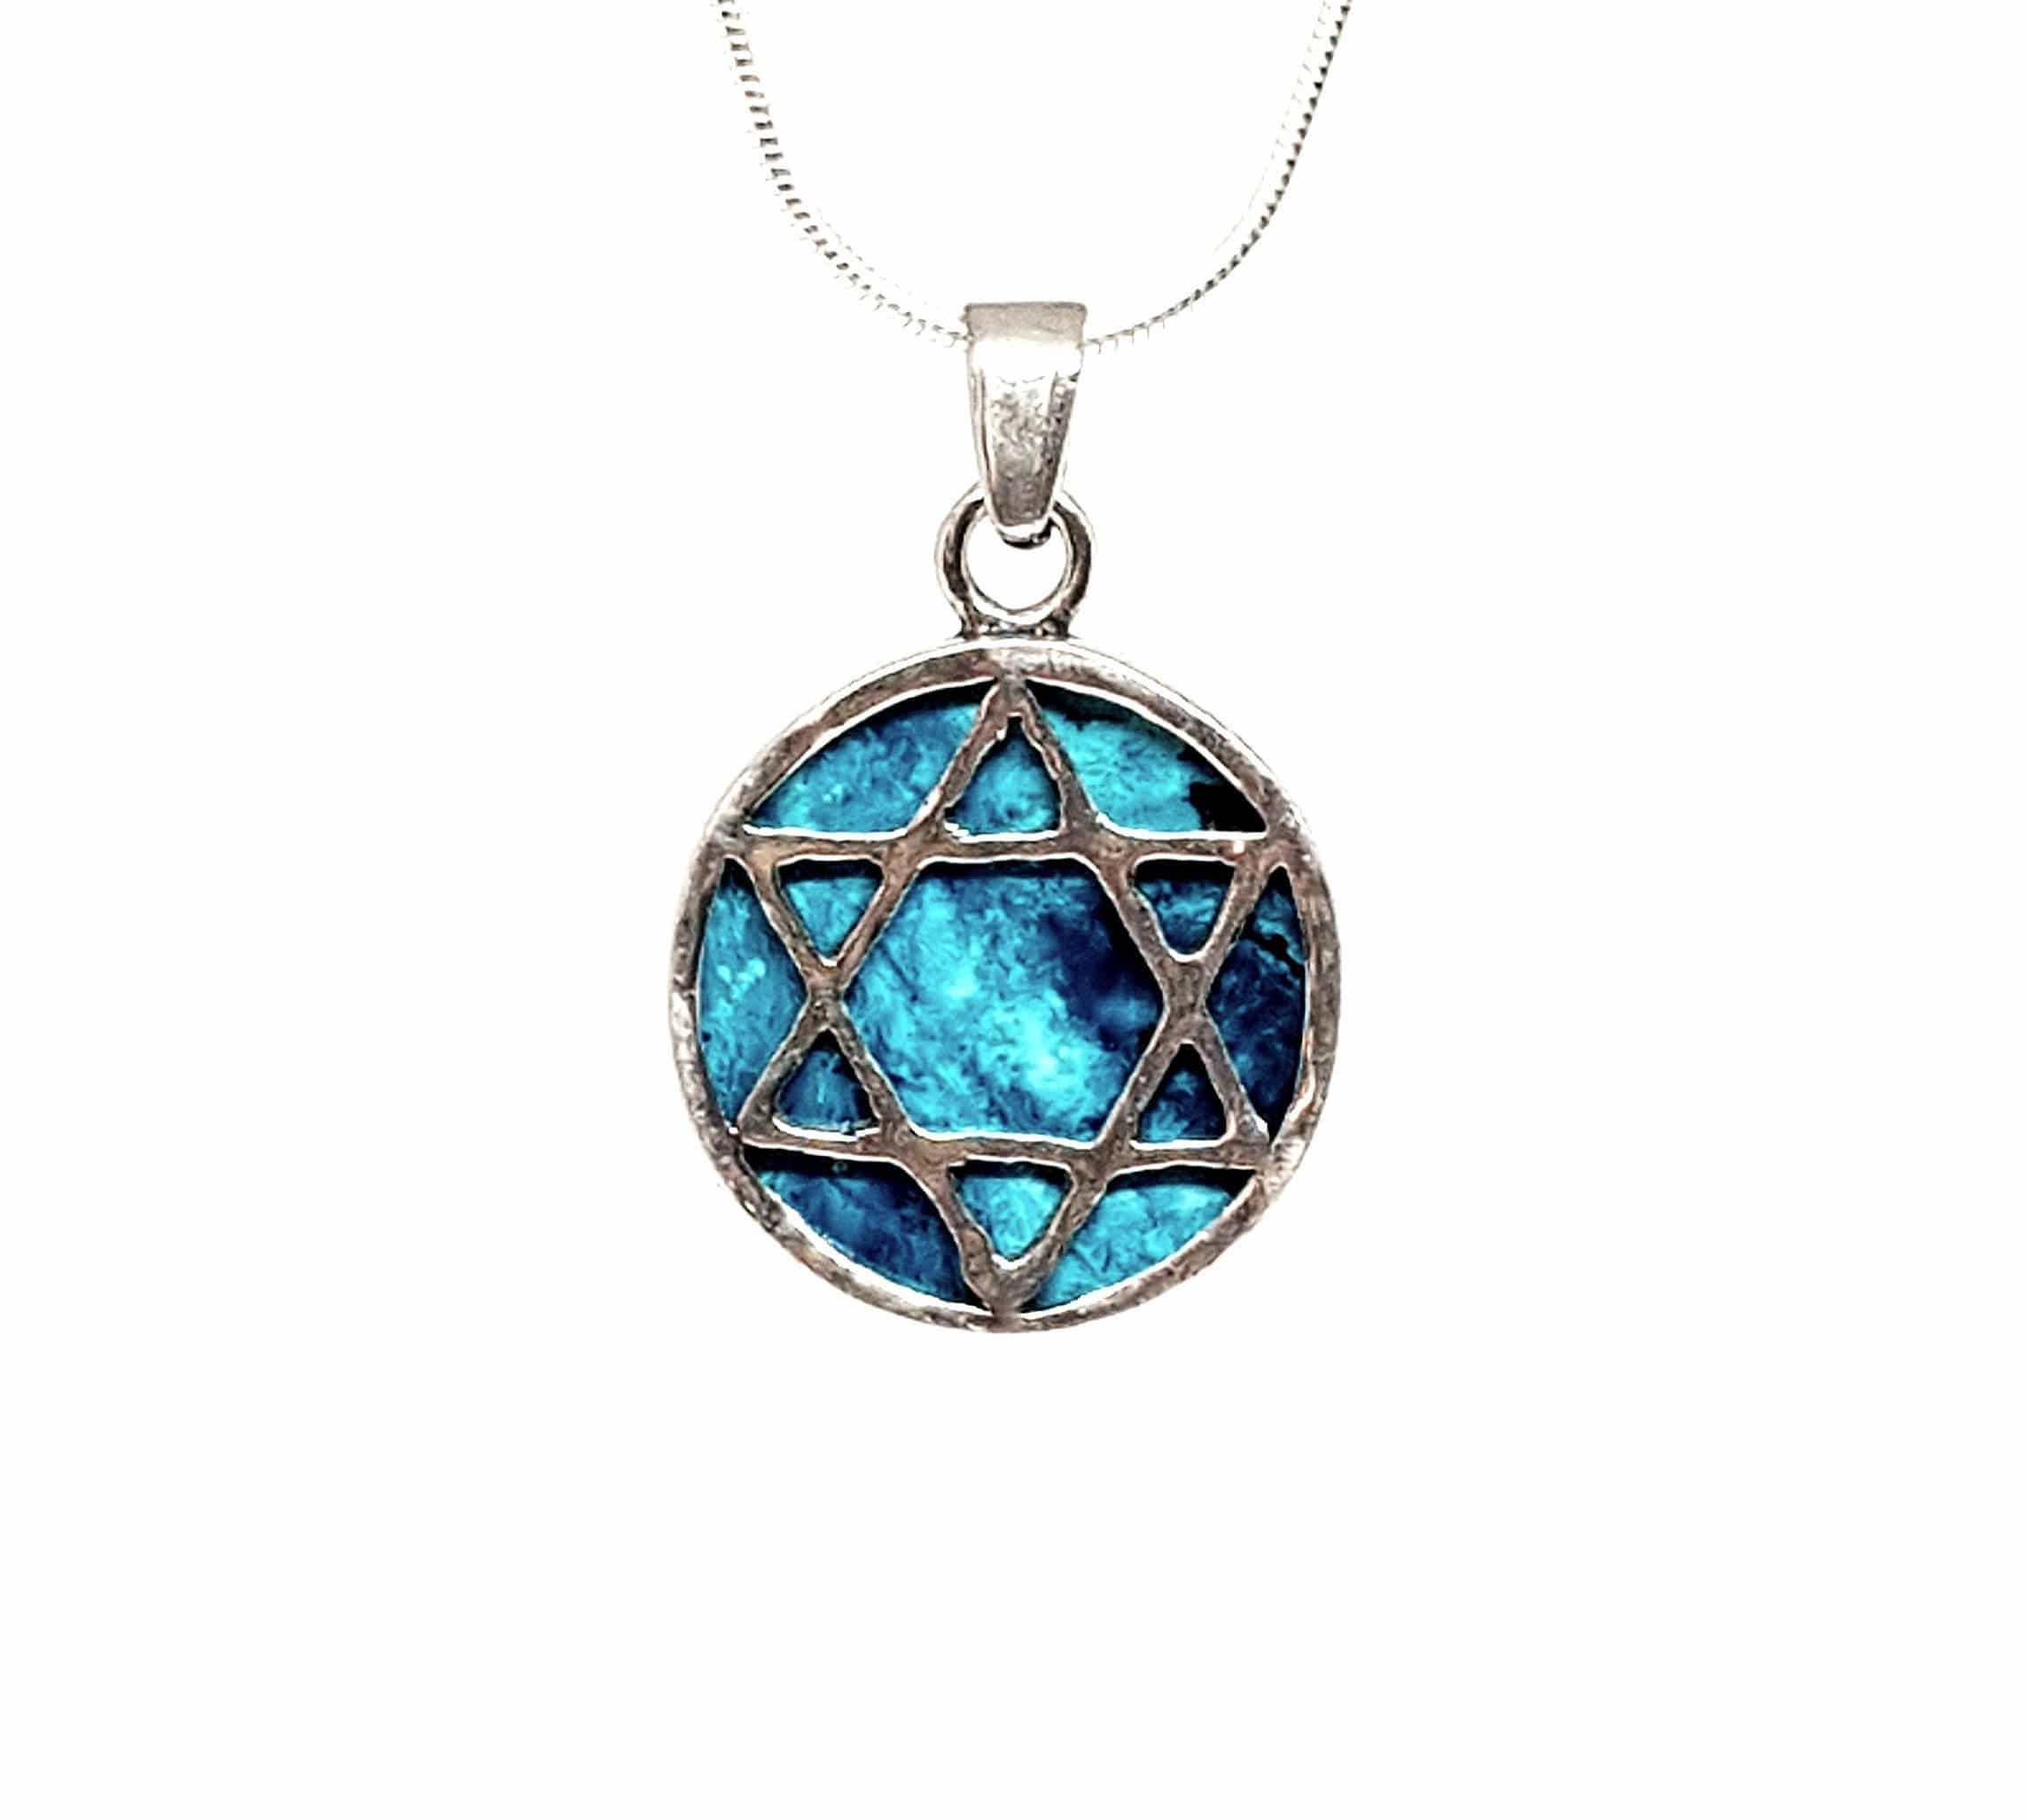 Eilat stone 925 Silver Filigree Star of david Pendant ,Jerusalem star of david ,Eilat stone Star of David Pendant